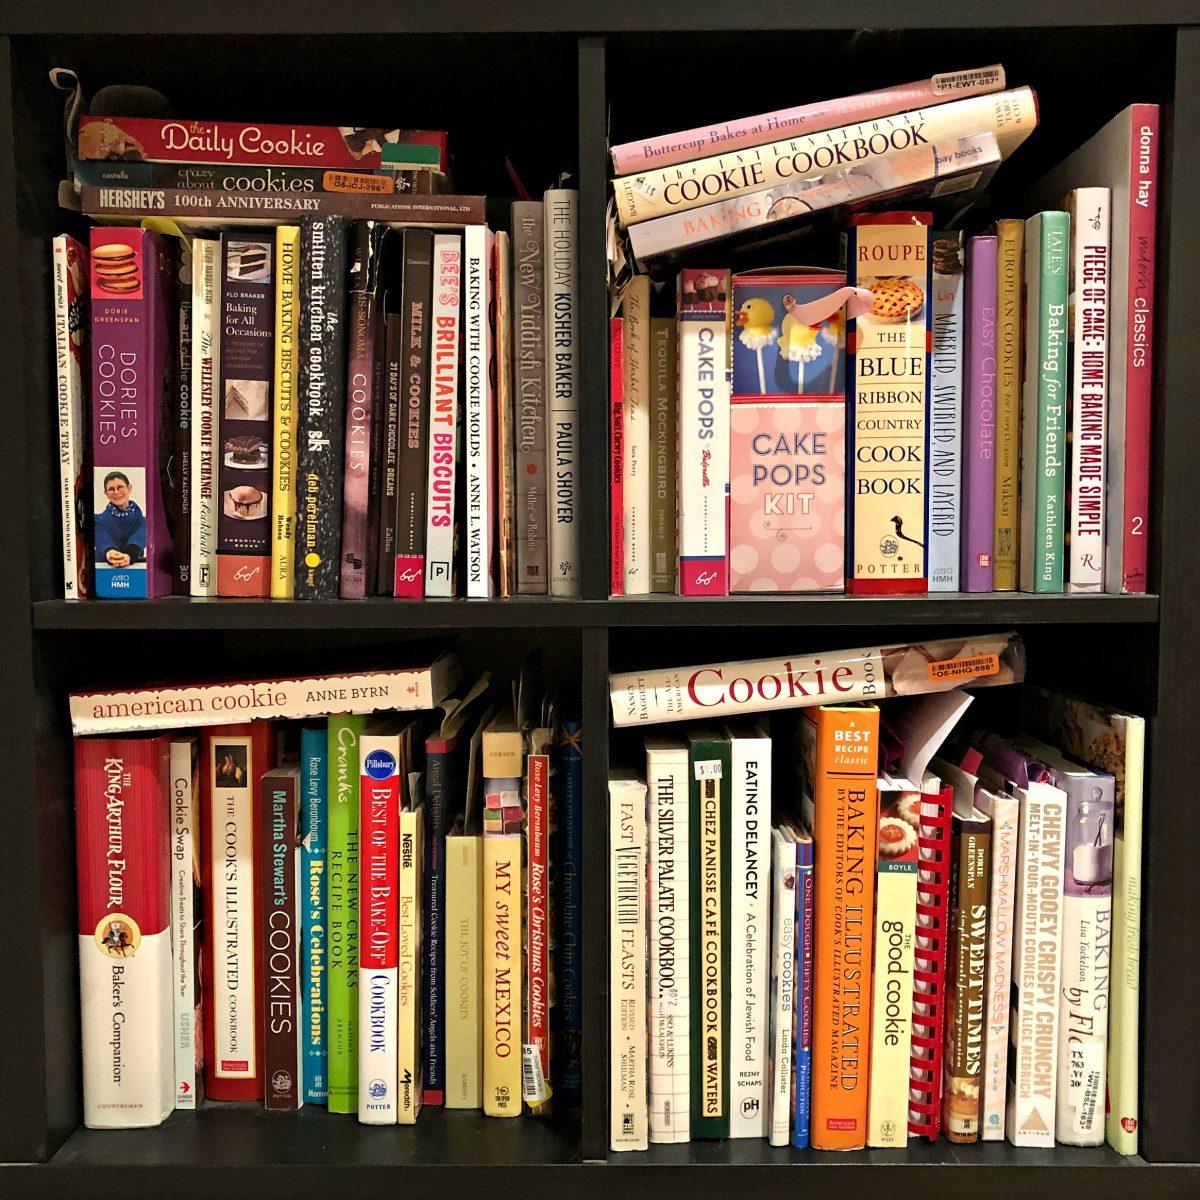 Bookshelf filled with baking cookbooks.